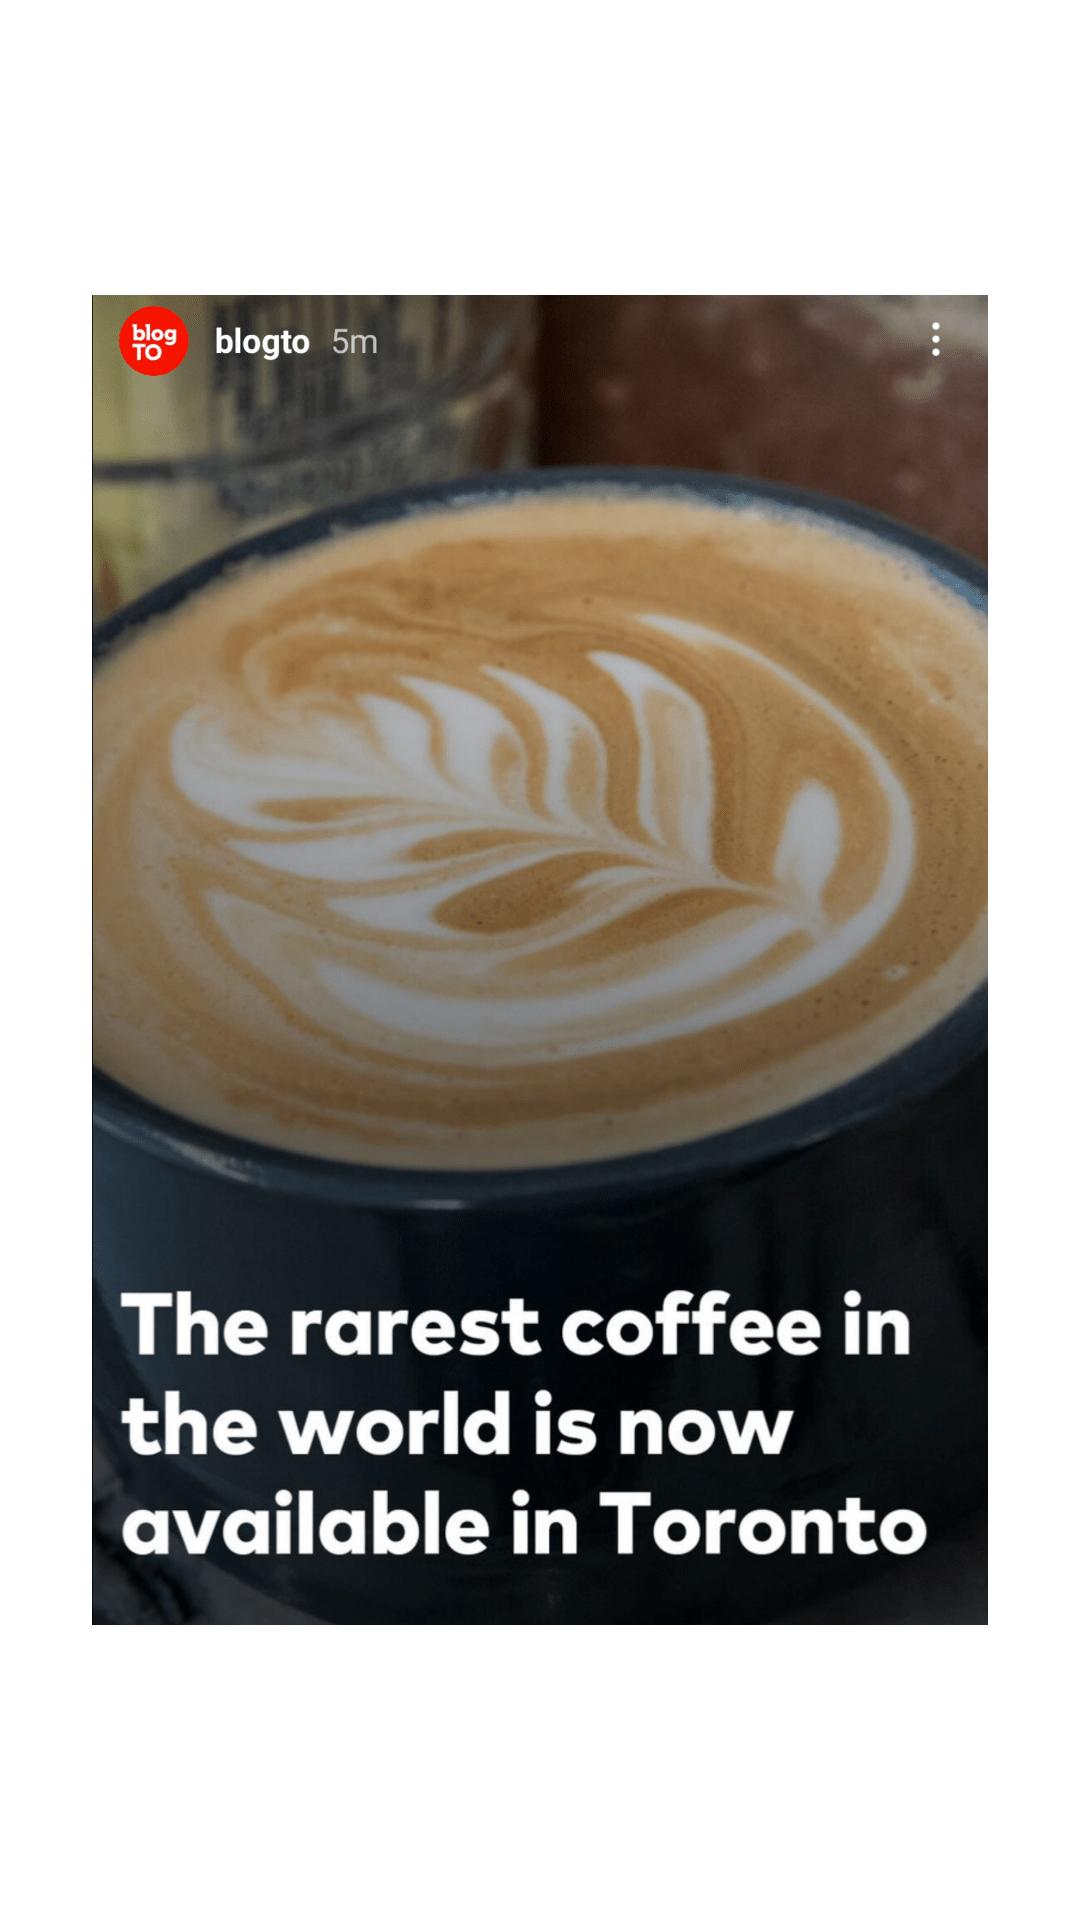 LeClair Organics featured on blogTO, worlds rarest coffee in Toronto, specialty coffee Toronto